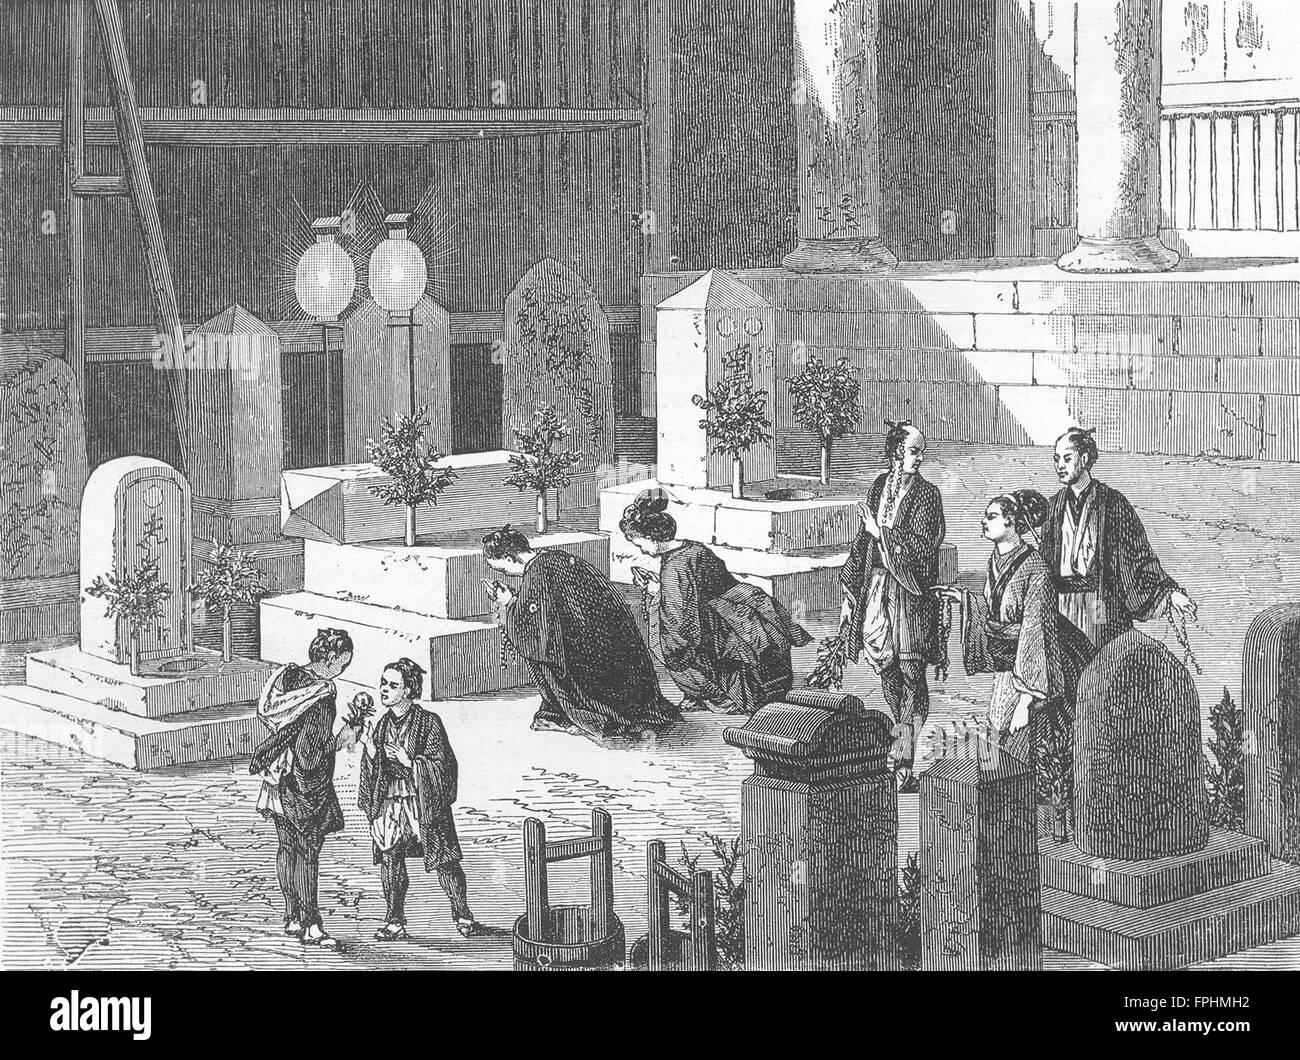 JAPAN: Funeral Ceremonies, antique print 1880 - Stock Image